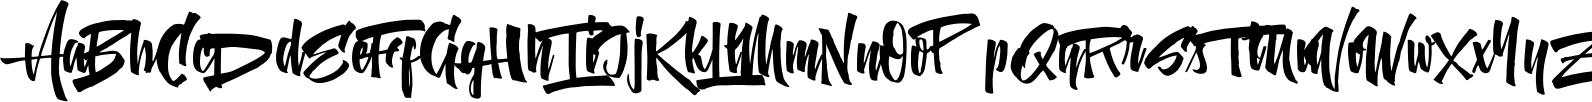 Austtin